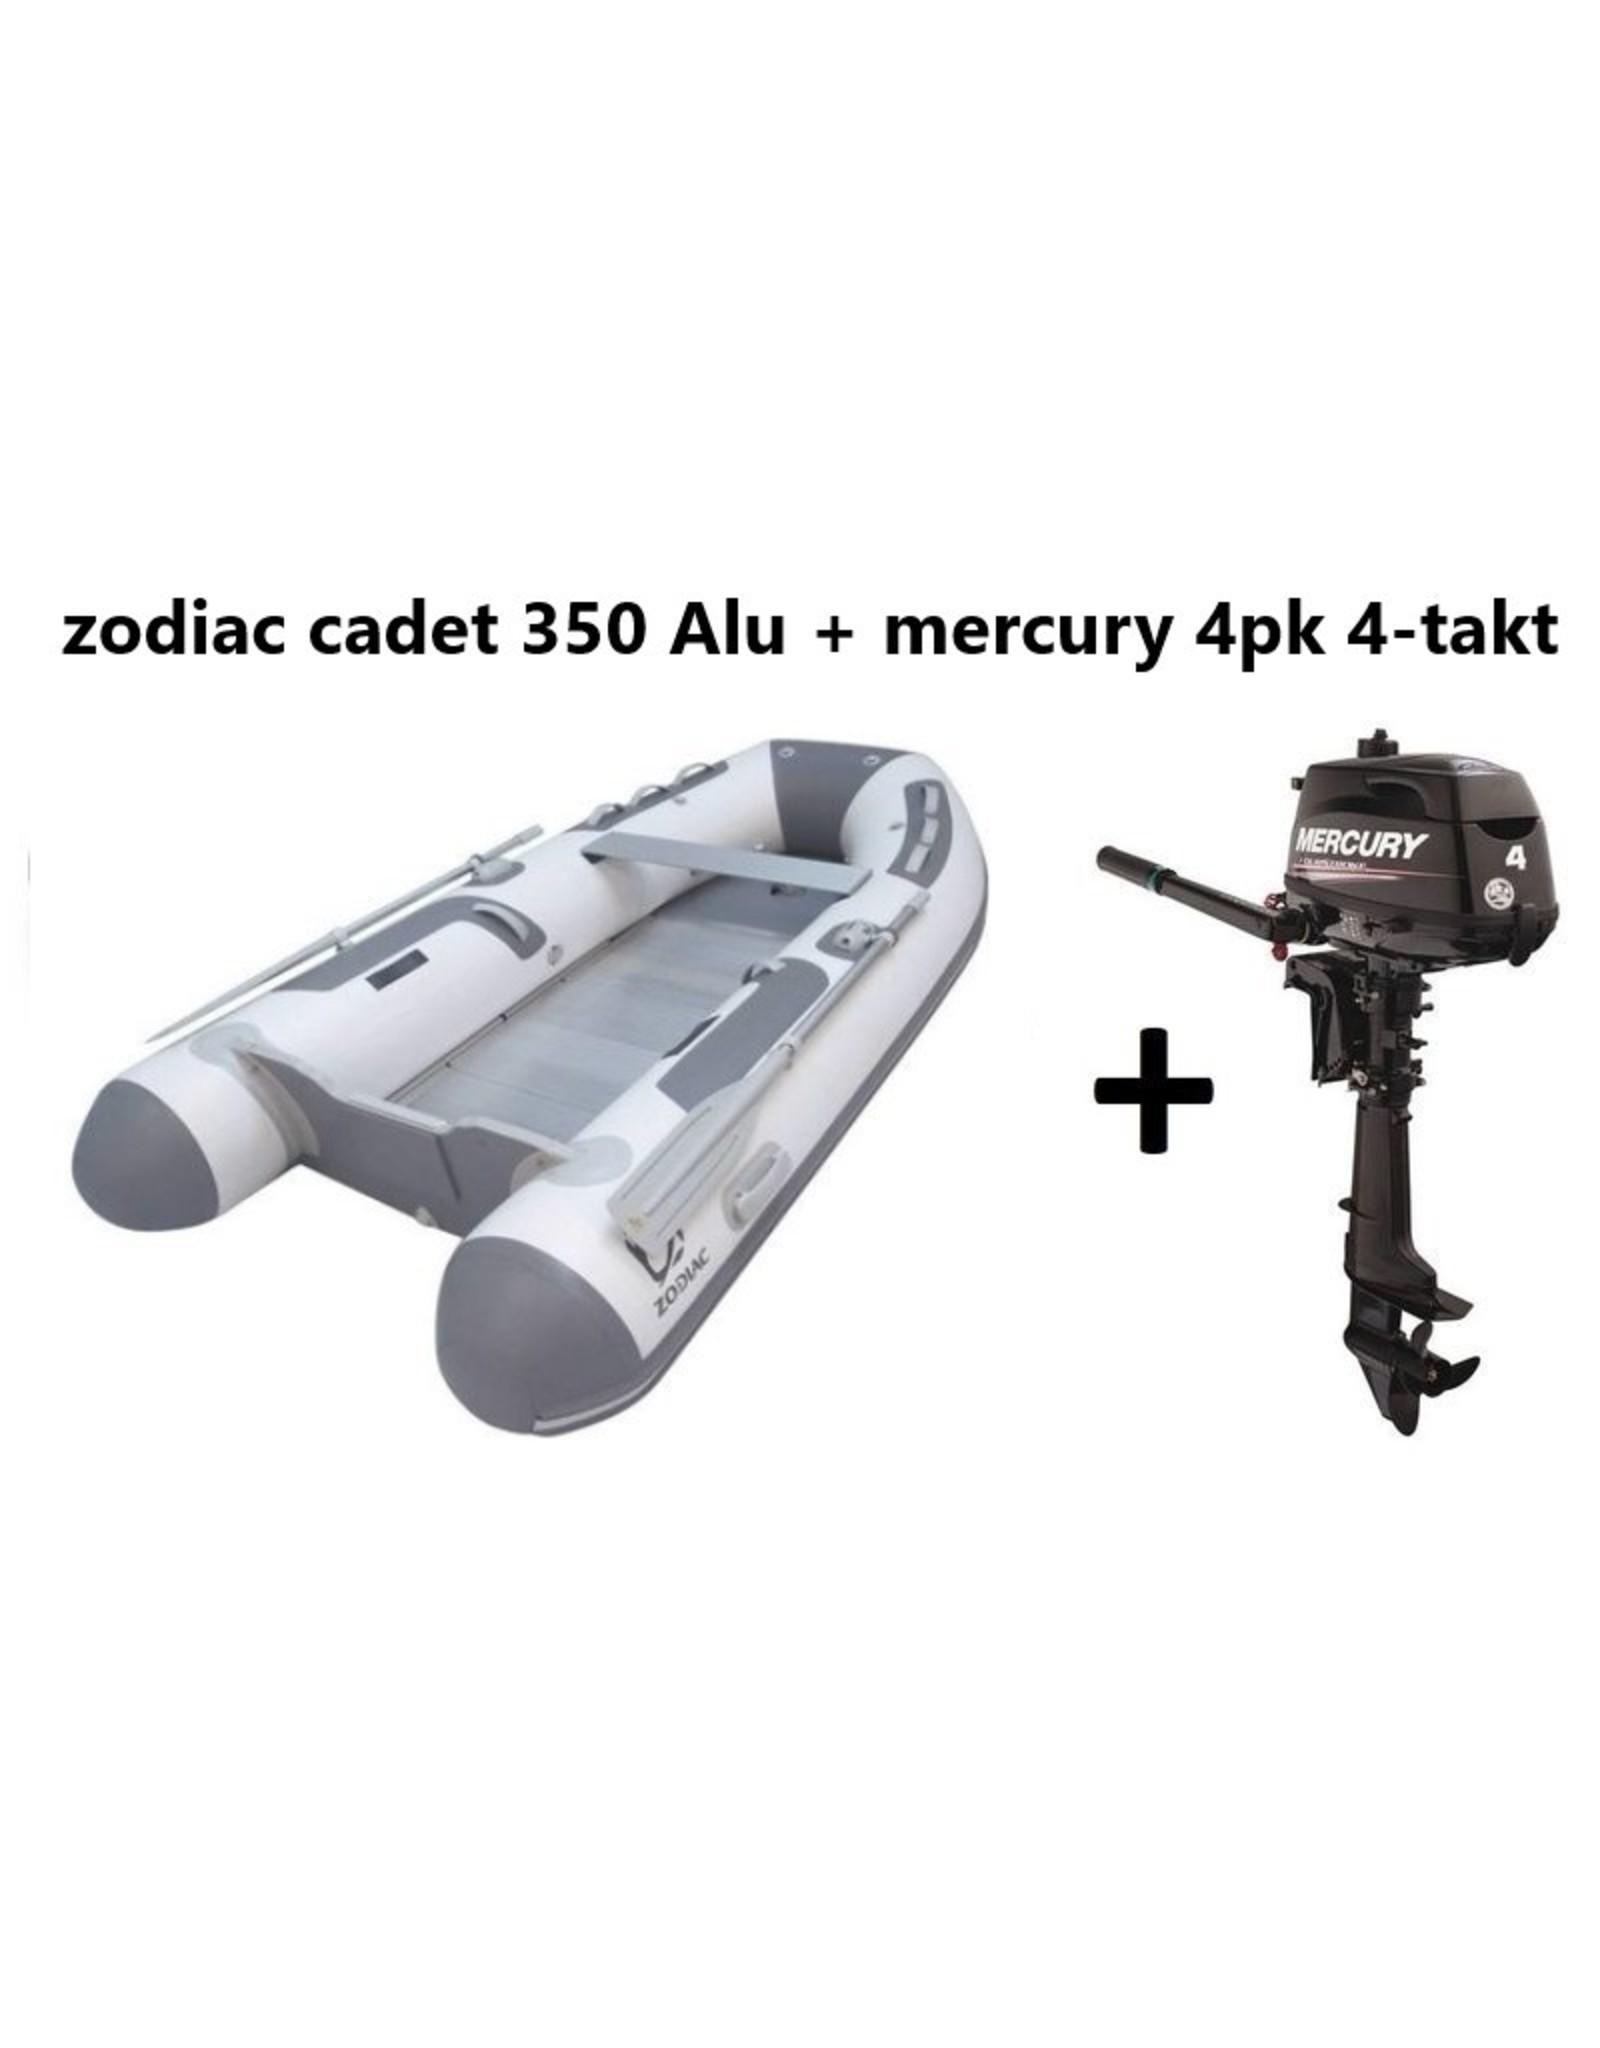 Zodiac Zodiac Cadet 350 Alu + Mercury 4pk 4-takt (Vaarbewijsvrij!)